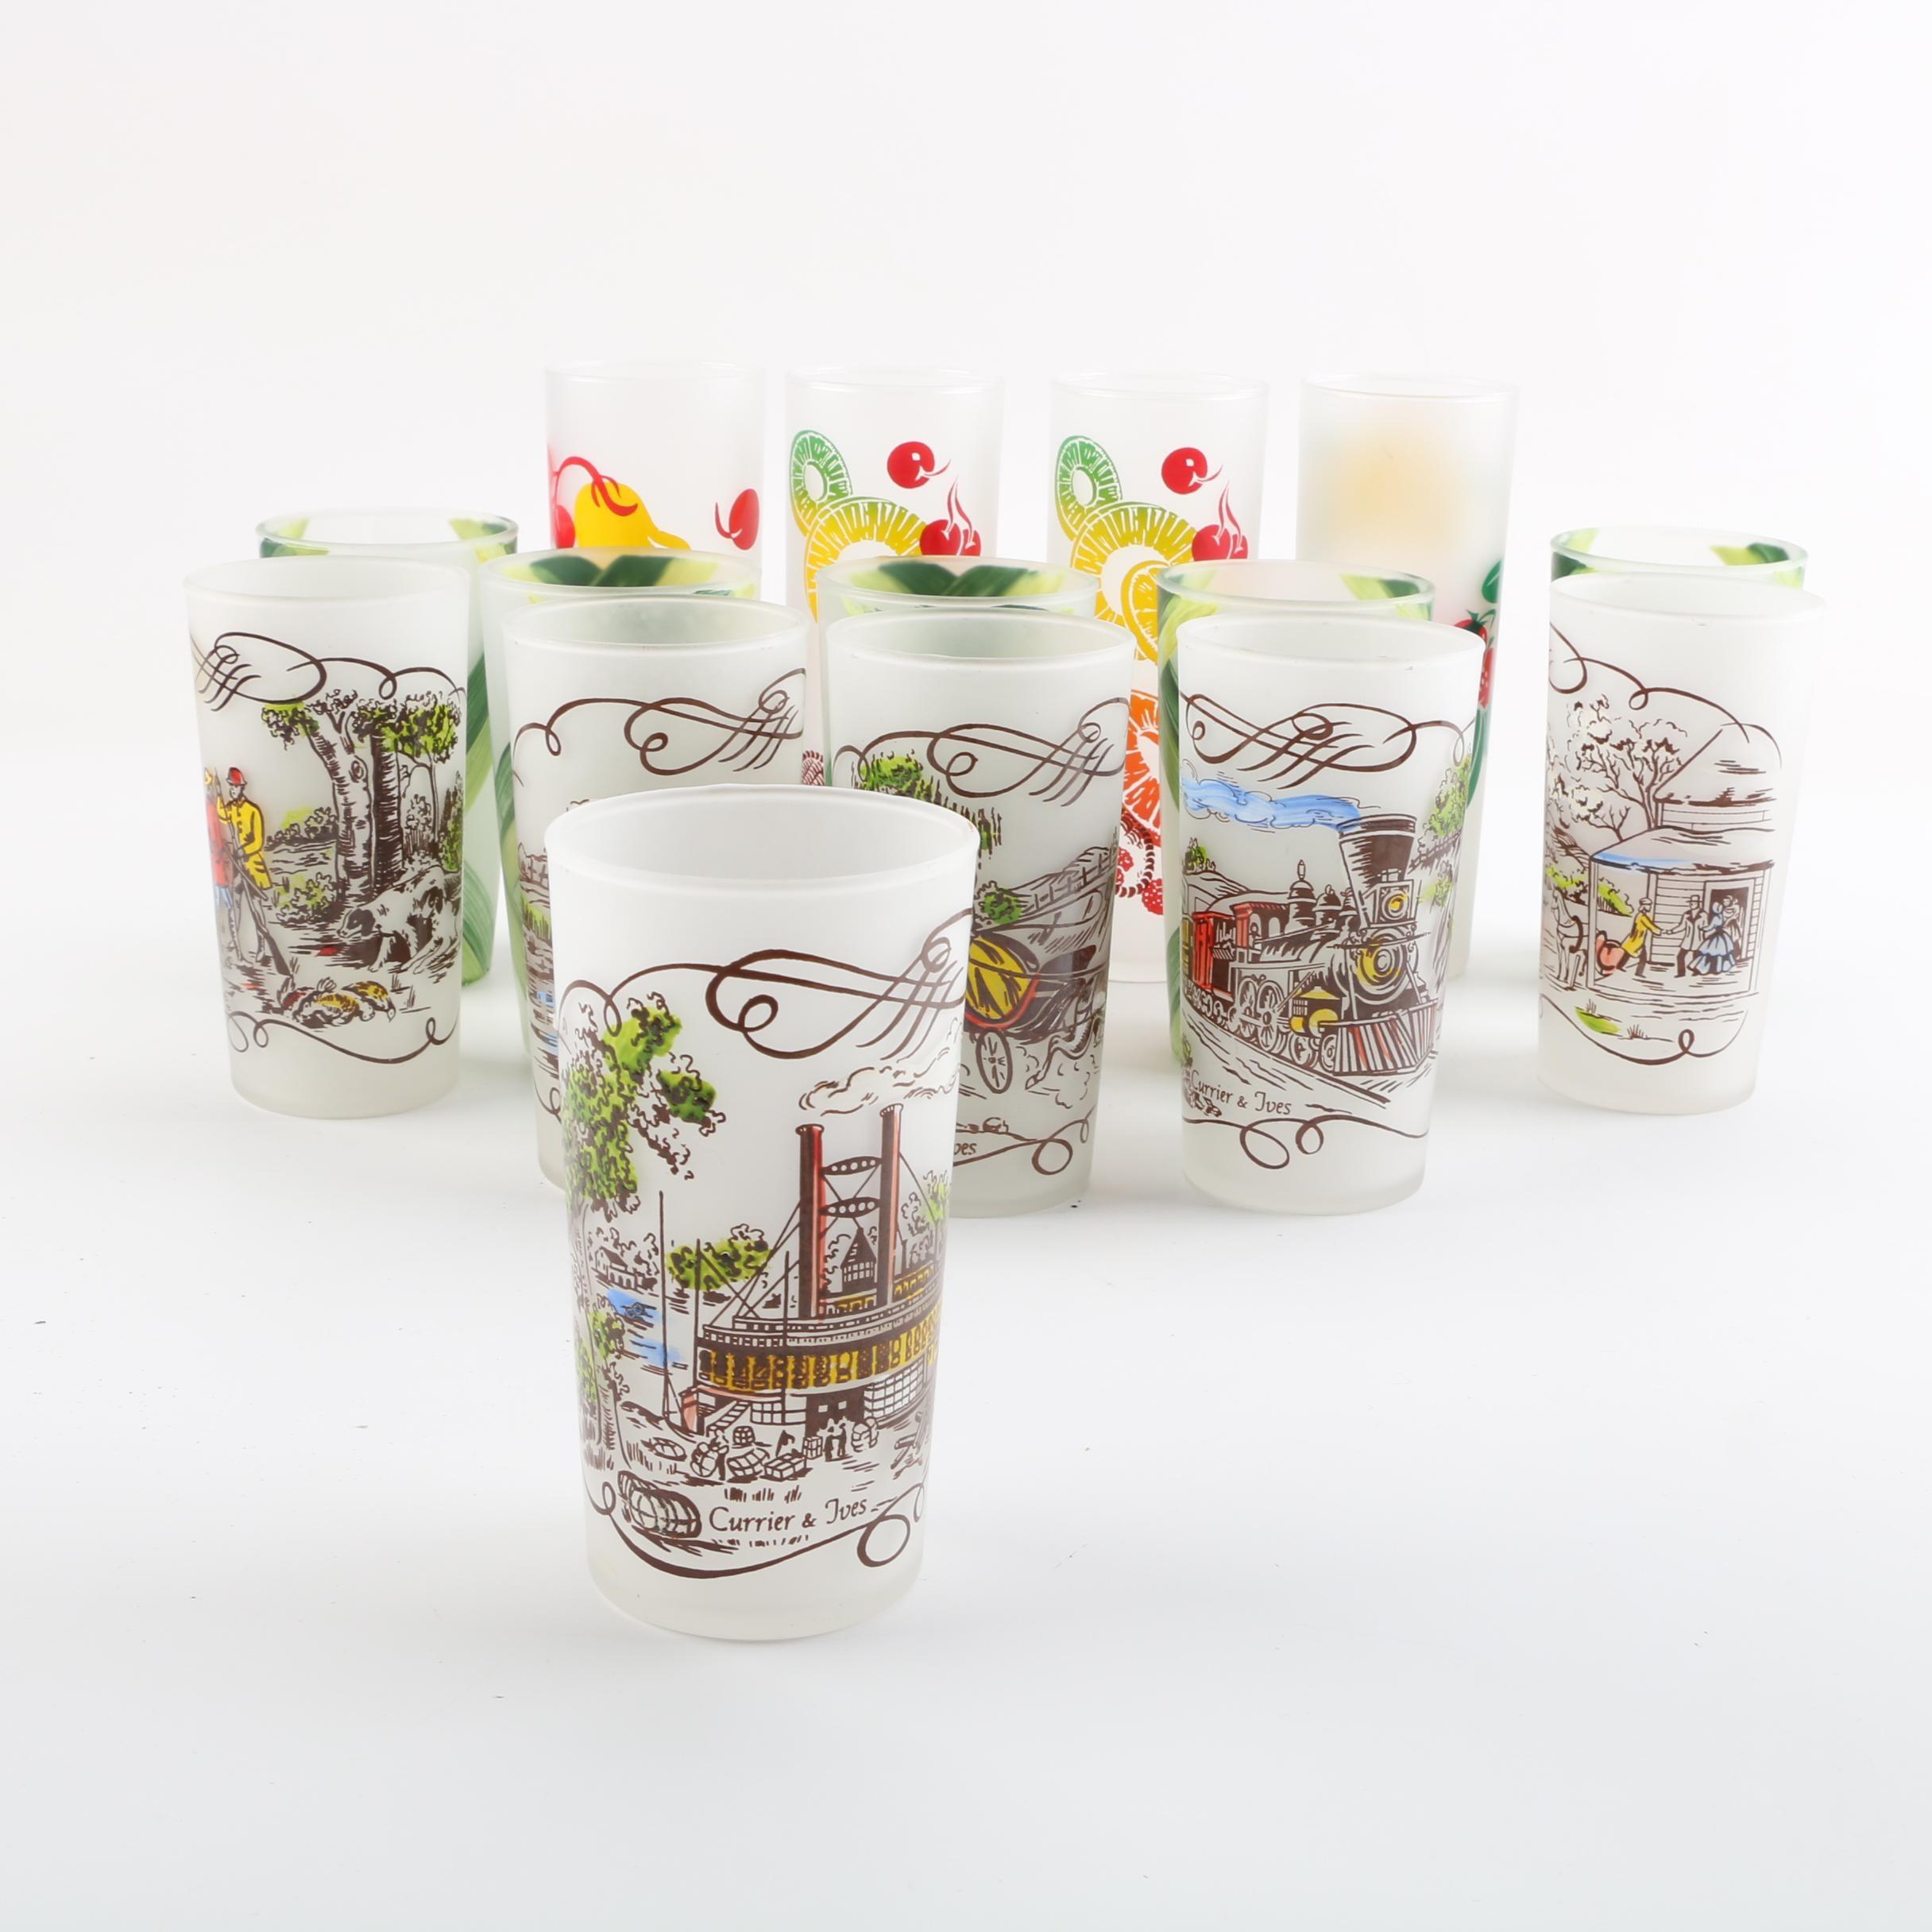 Decorative Frosted Glasses Including Vintage Currier & Ives